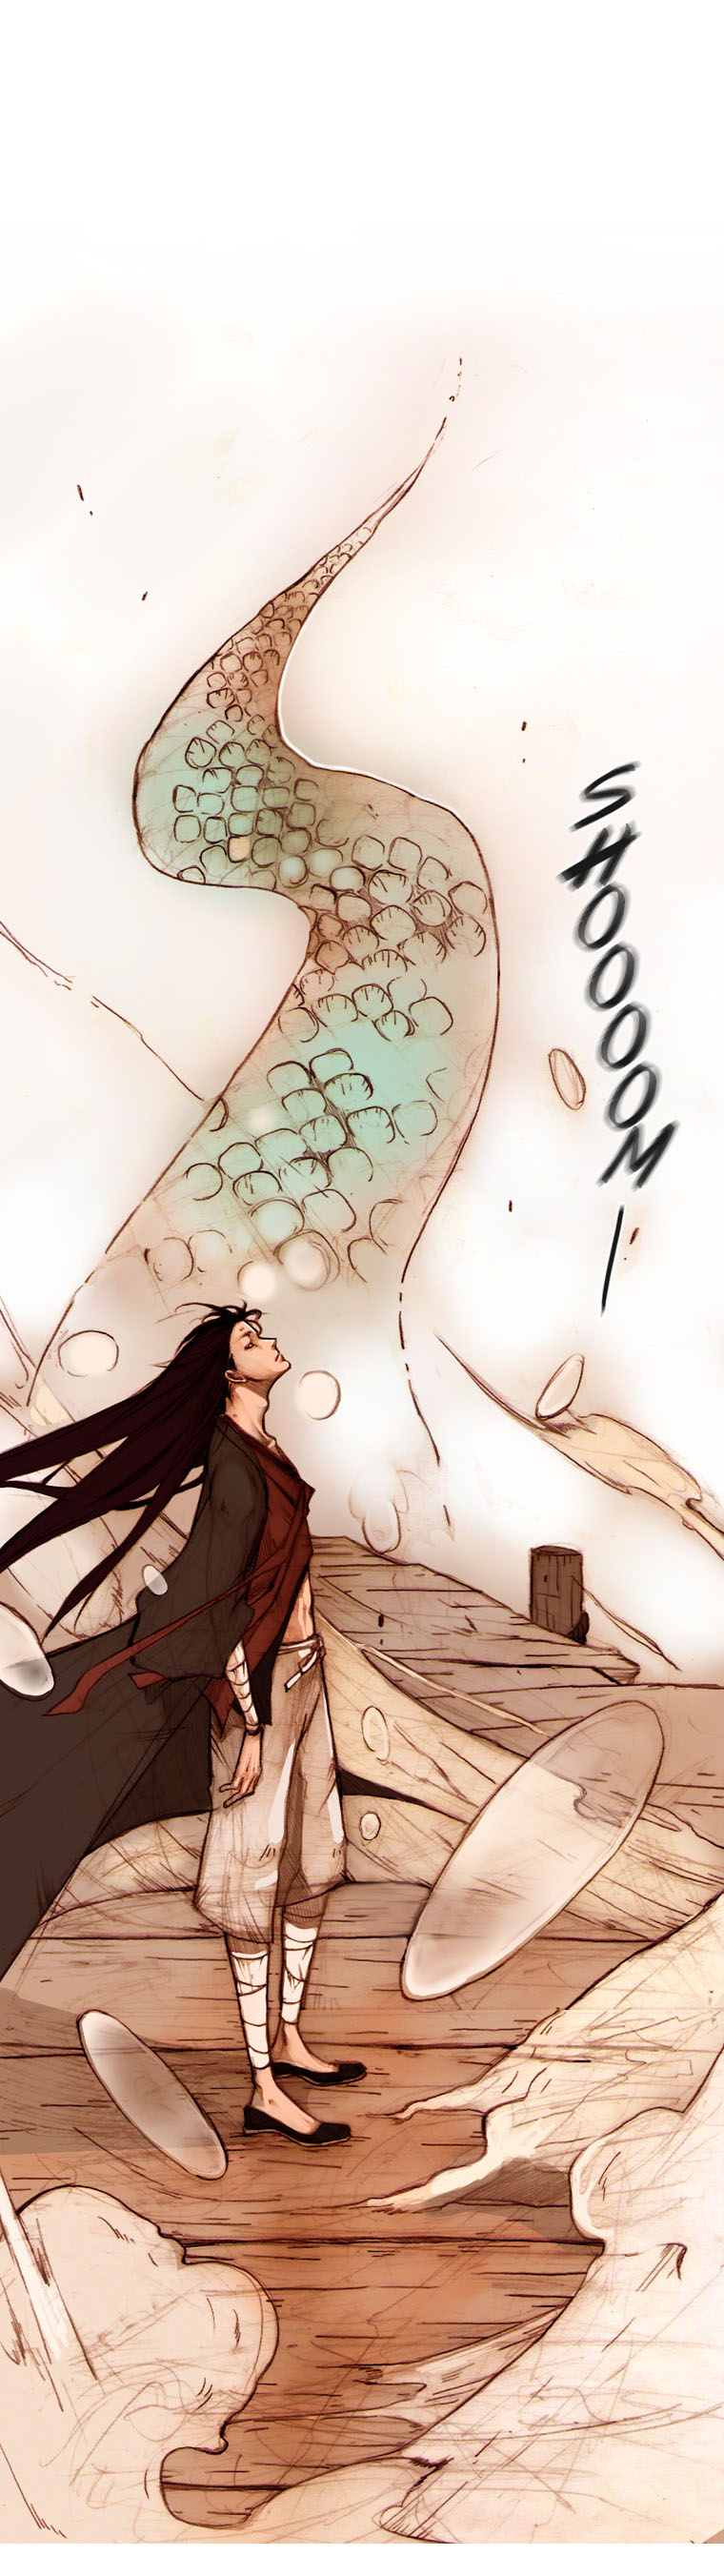 Hongdo Ch.05, Hongdo manga, Read Hongdo Ch.05 chapter, Hongdo Ch.05 Page 58